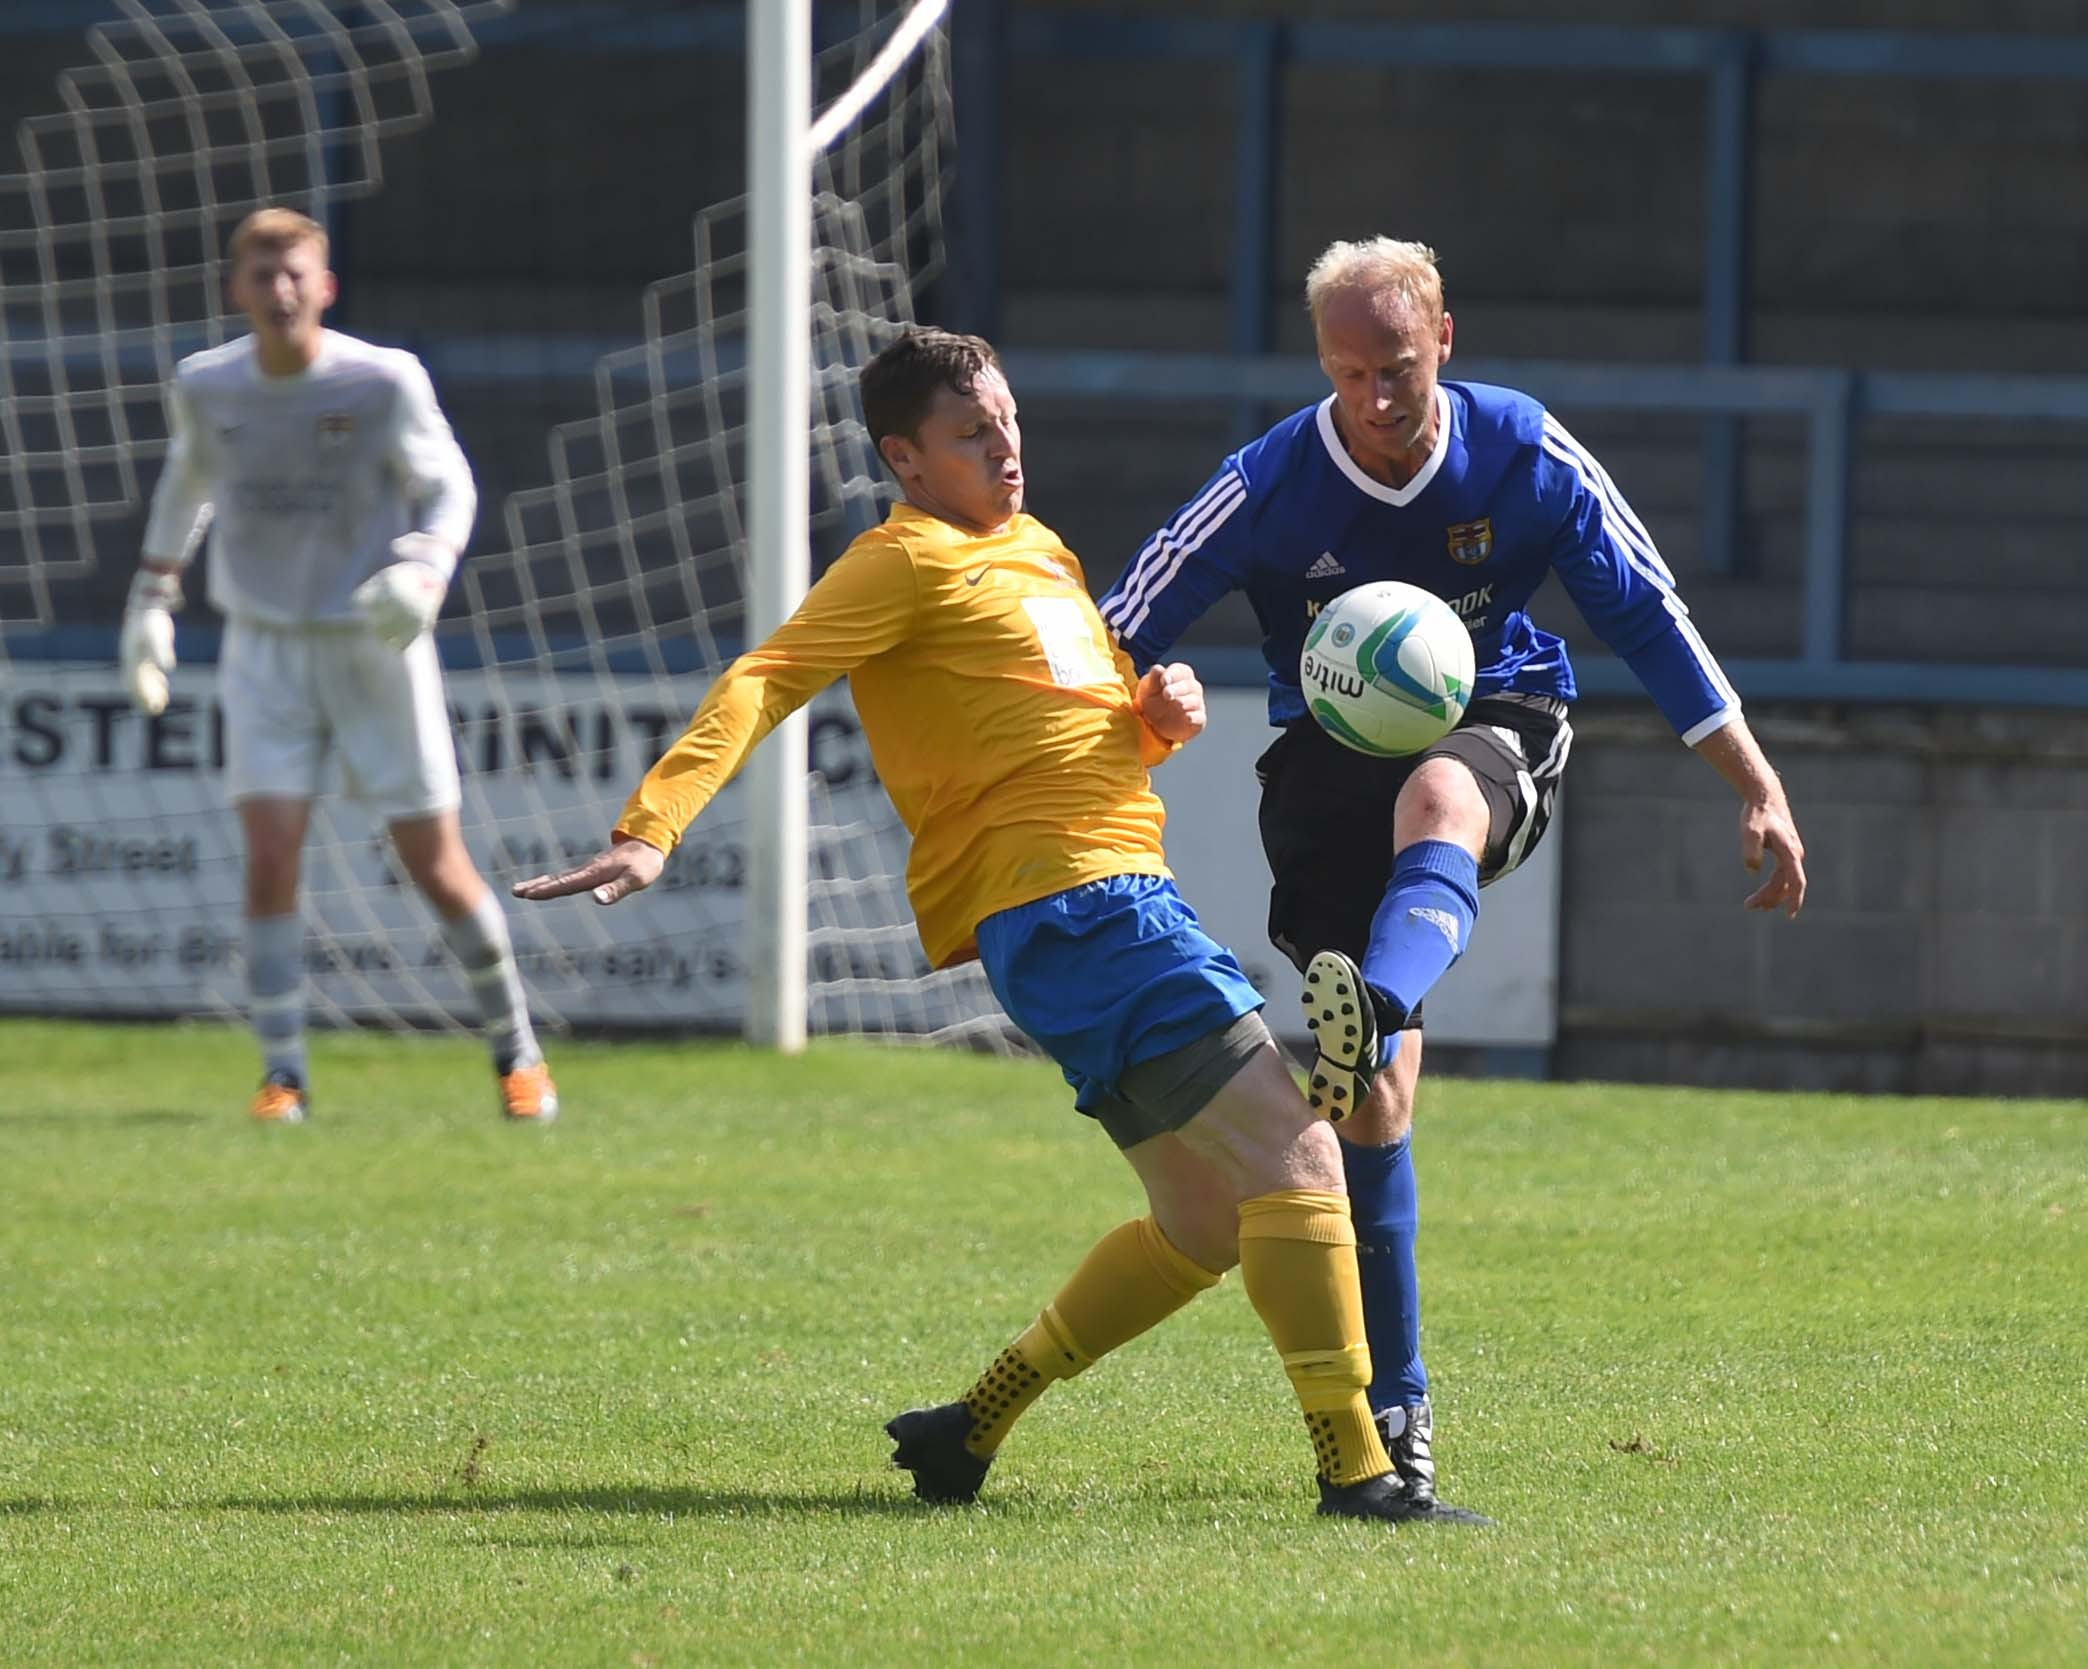 足球:Sturminster Newton坚持震惊Dorchester Sports